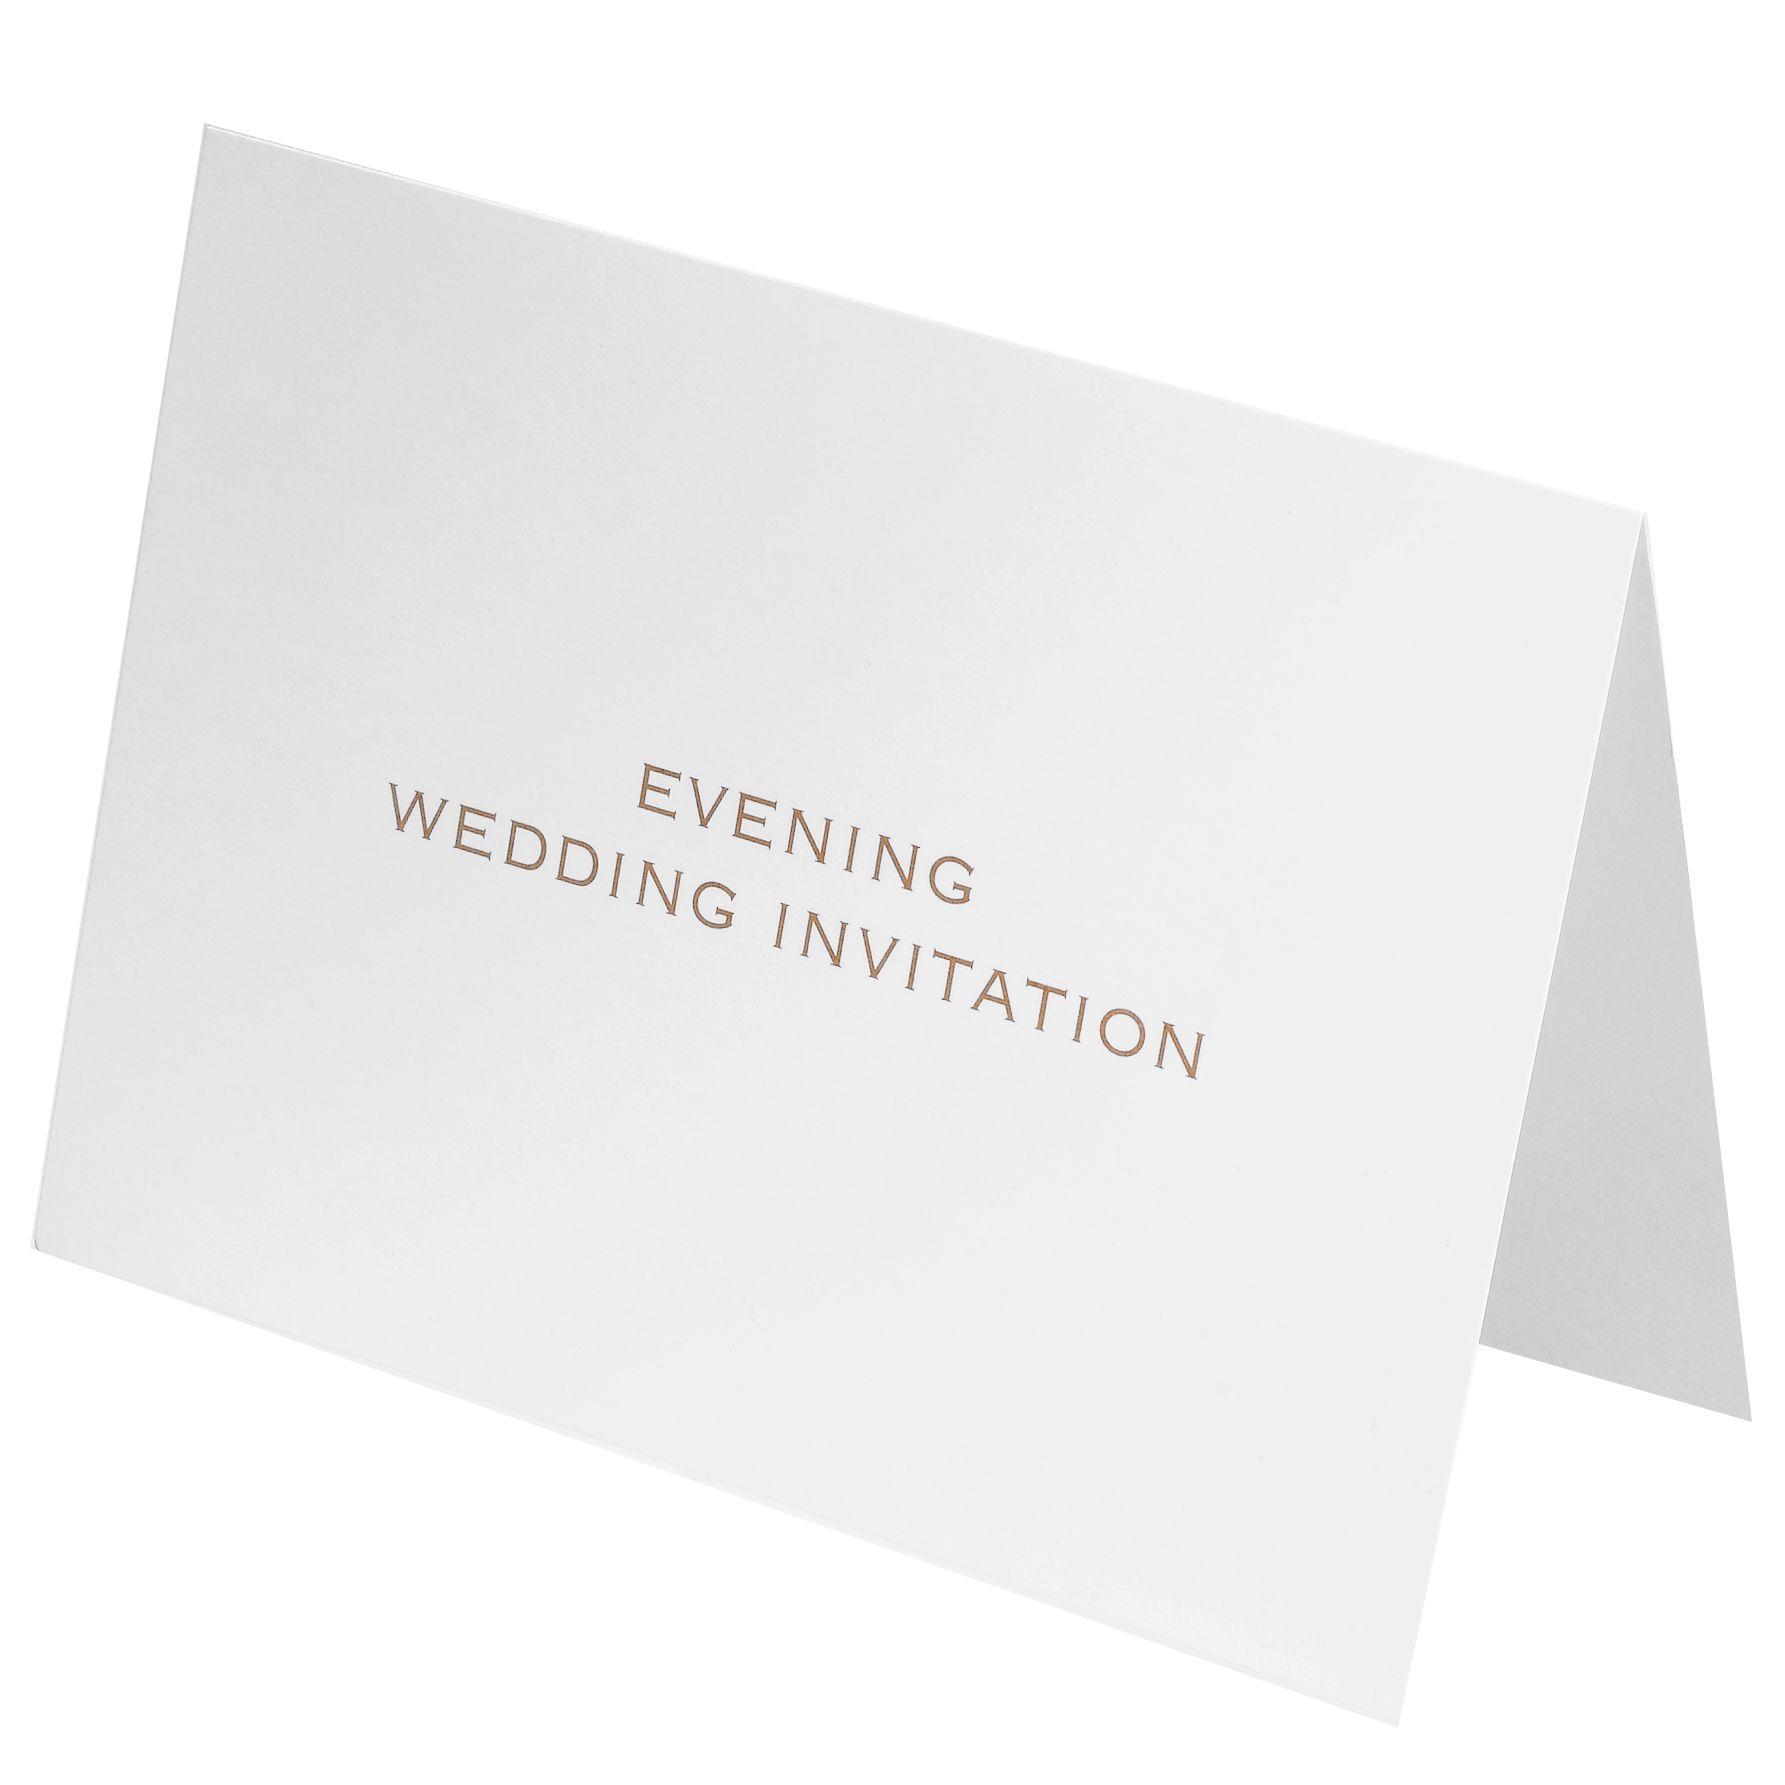 Evening wedding invitations john lewis – Weddings Room